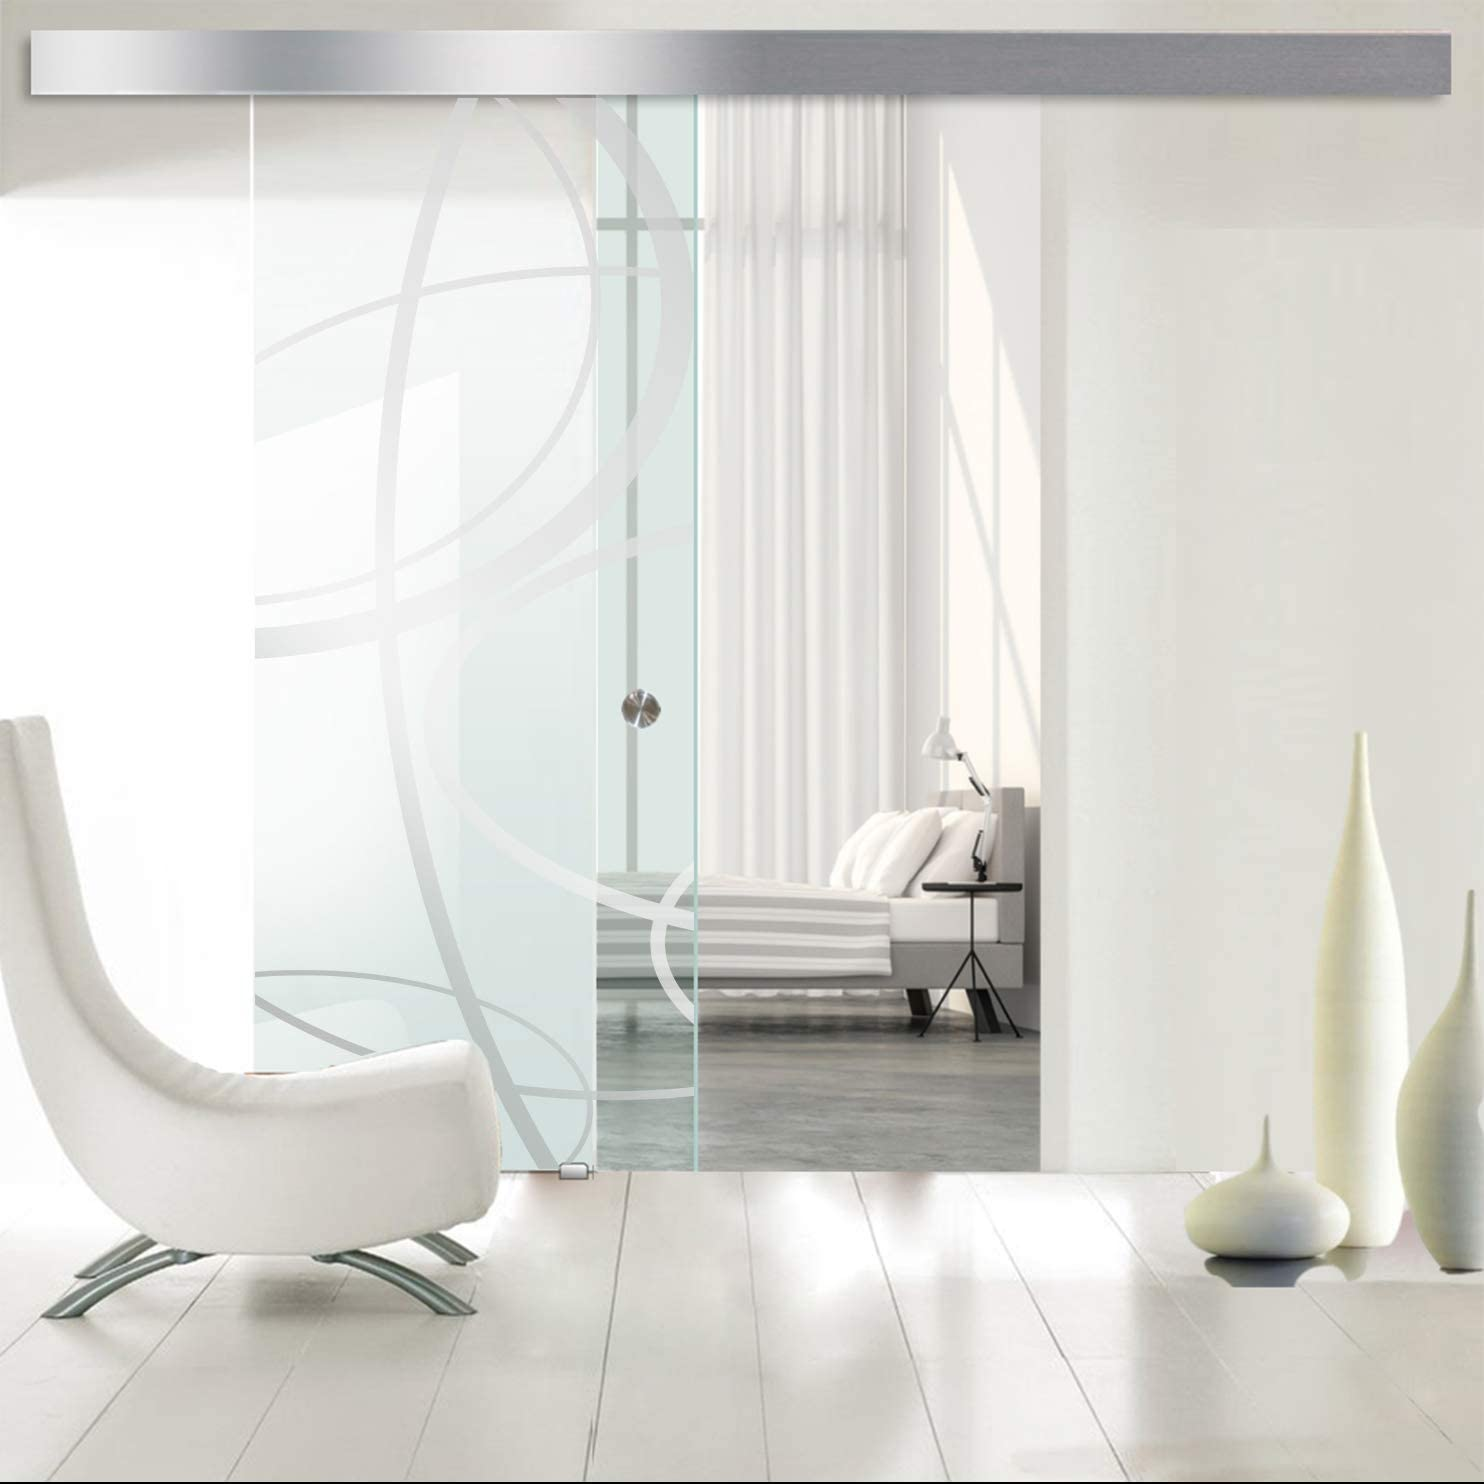 Modern Glass Art - Puerta de cristal deslizante para Boss de diseño interior - Cristal templado de seguridad de 8 mm de grosor, nano, revestido, accesorios de acero inoxidable SS304, transparente